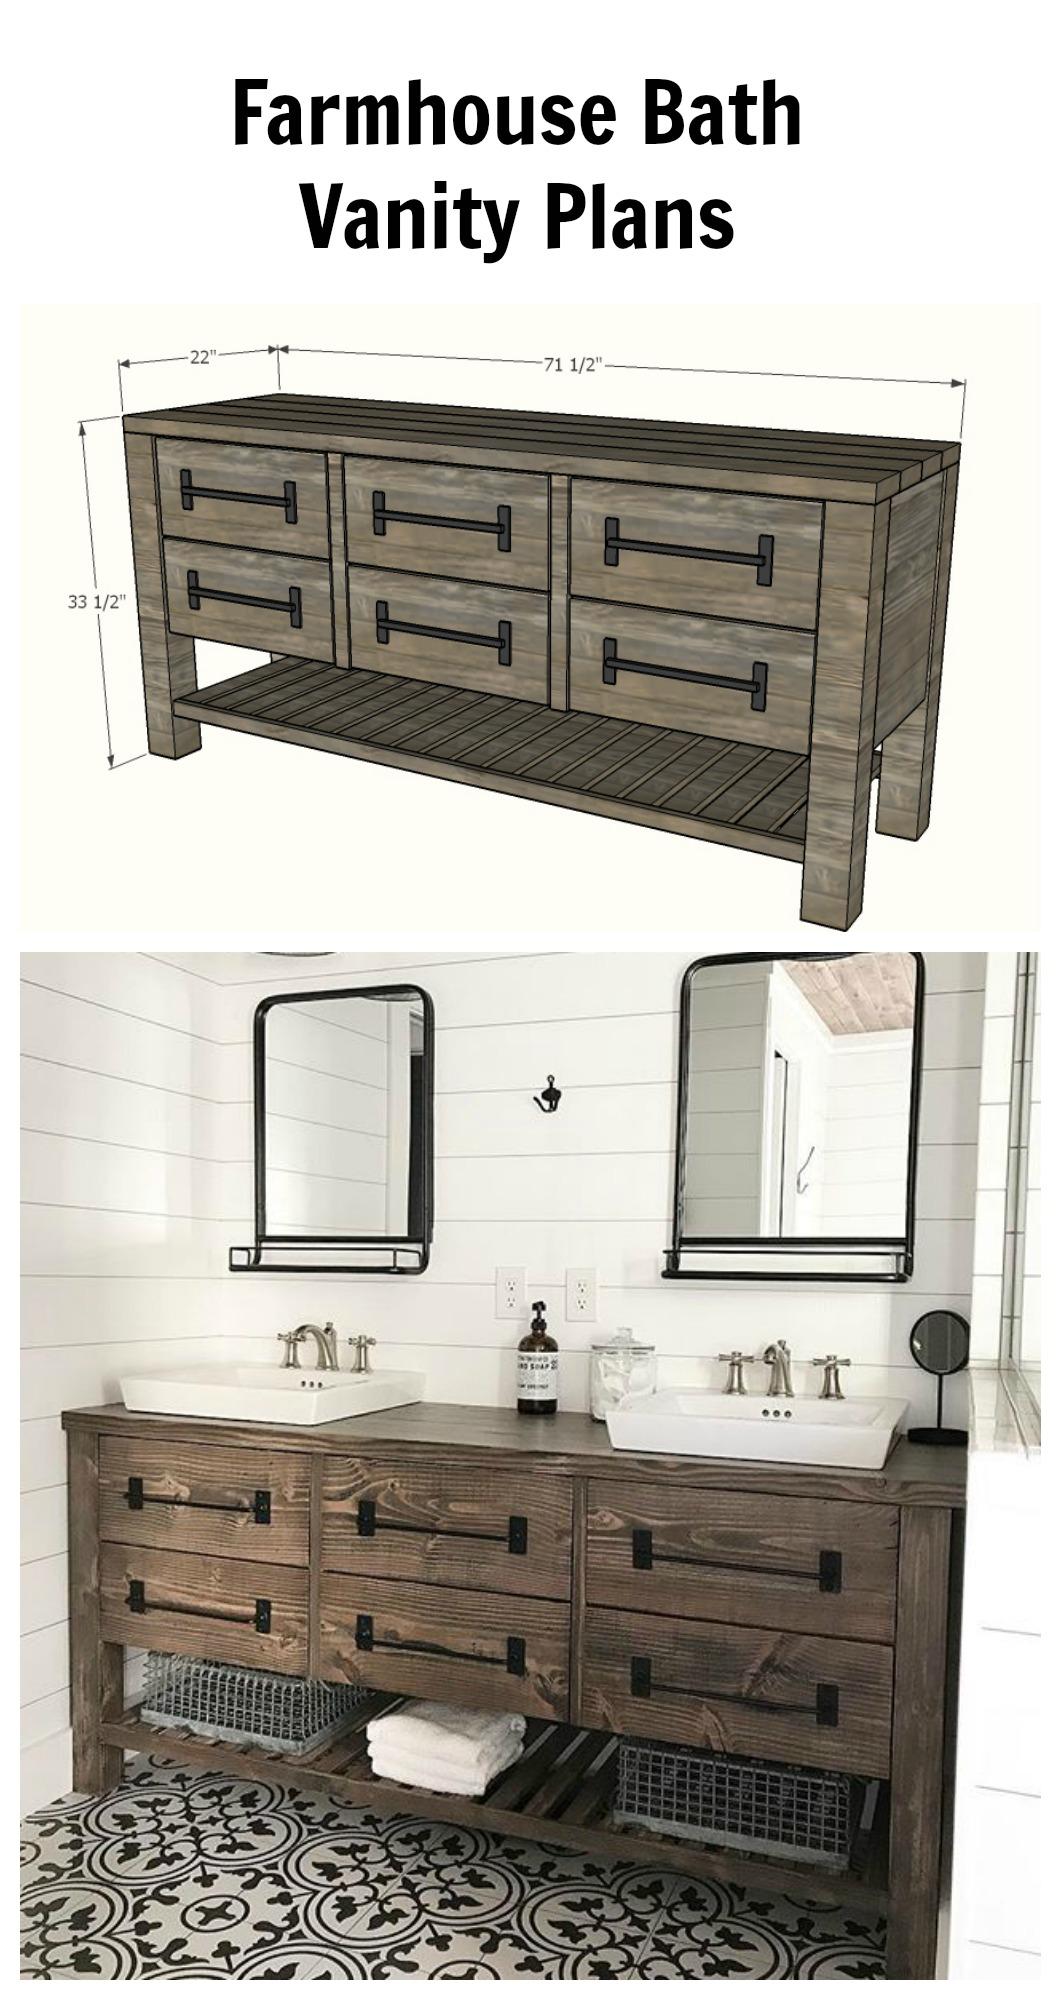 Modern Farmhouse Bathroom Vanity 48 Image Of Bathroom And Closet